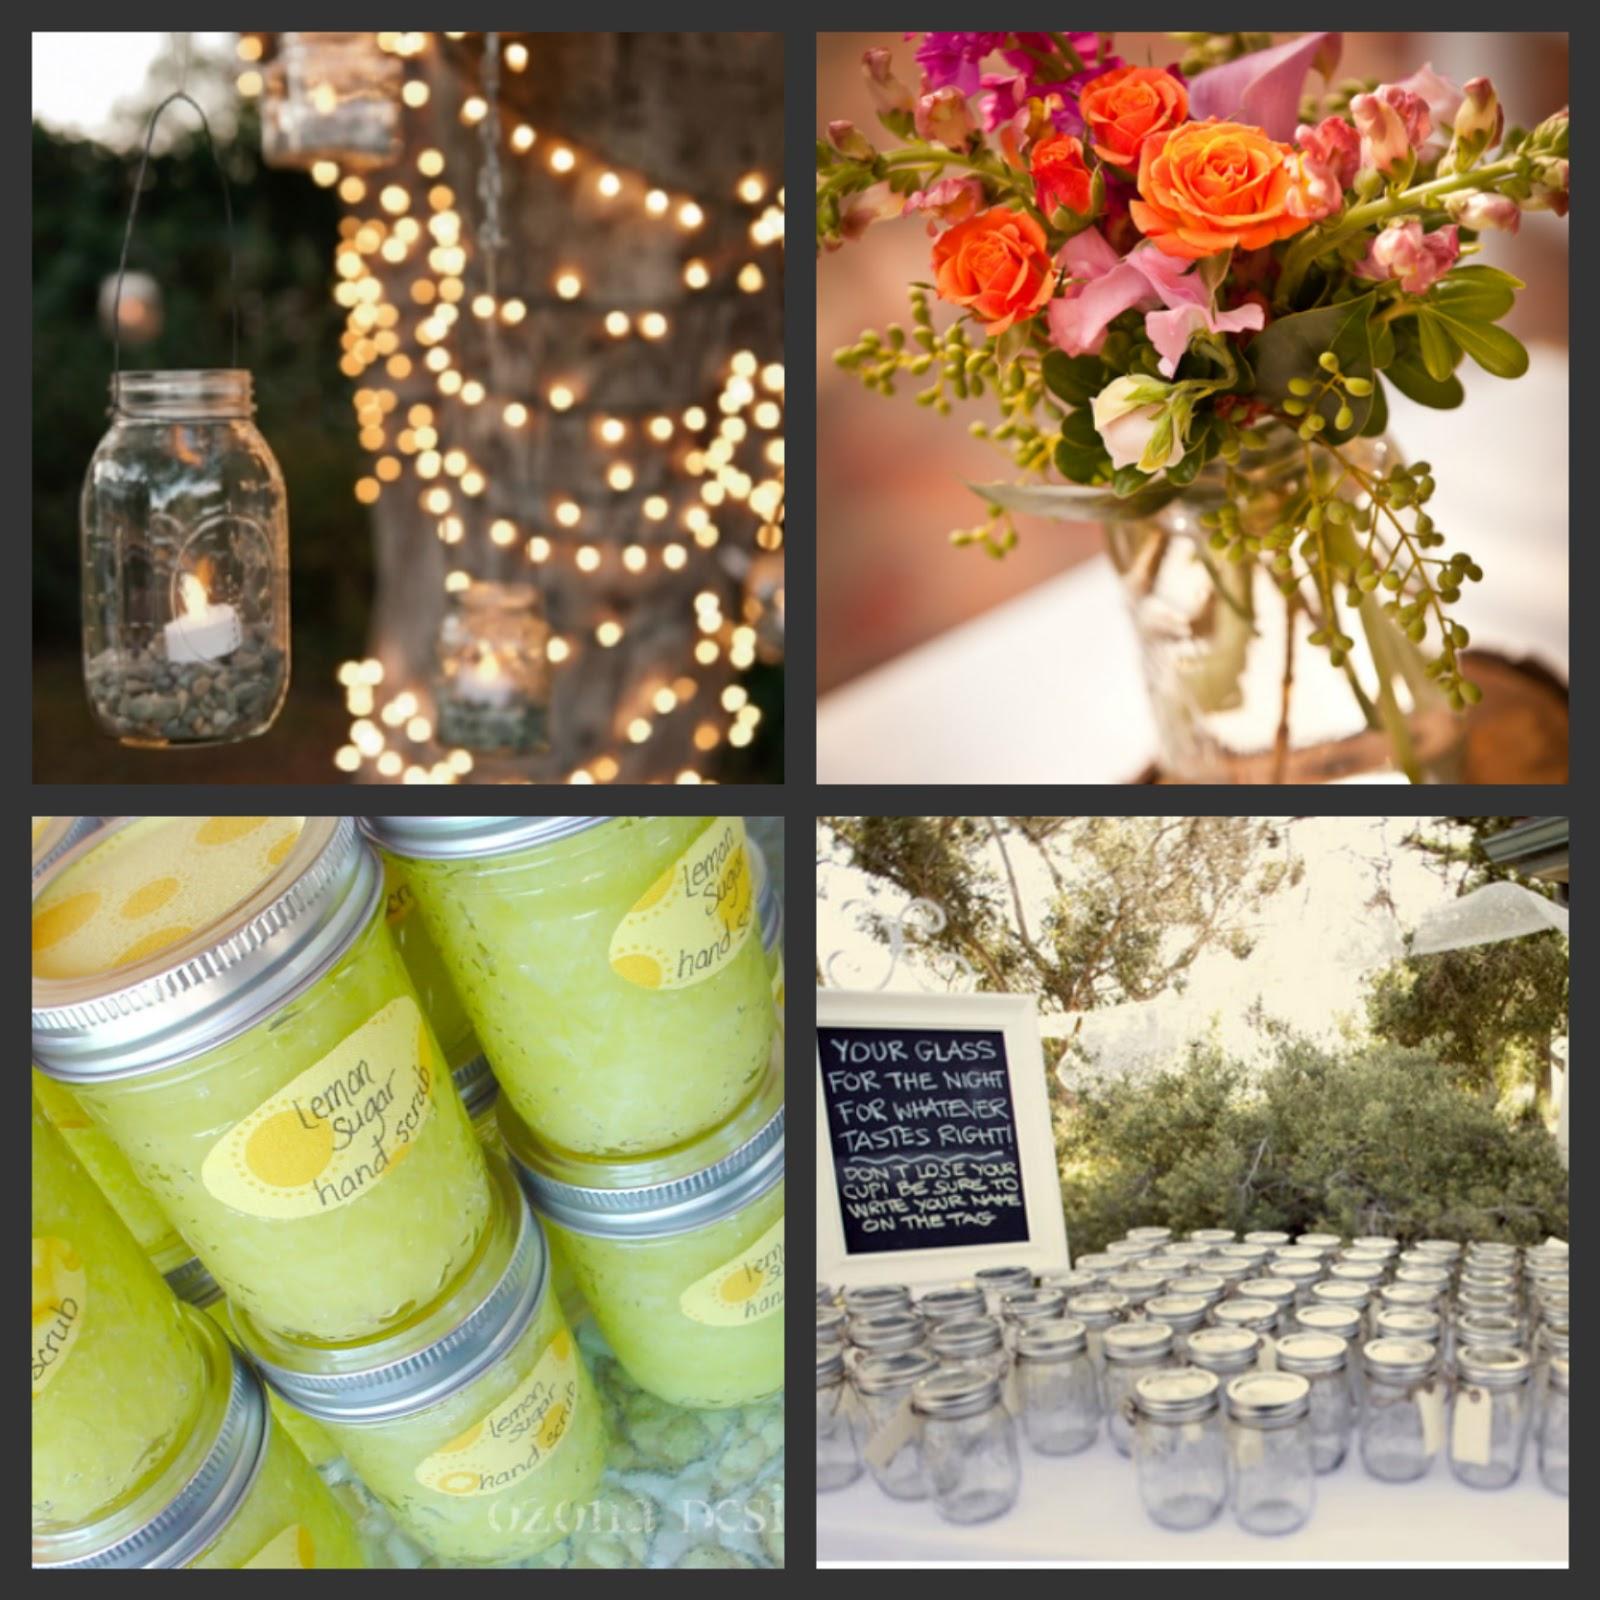 Southern Wedding Ideas Using Mason Jars: Weddings Are Fun Blog: Creative Ways To Use Mason Jars For